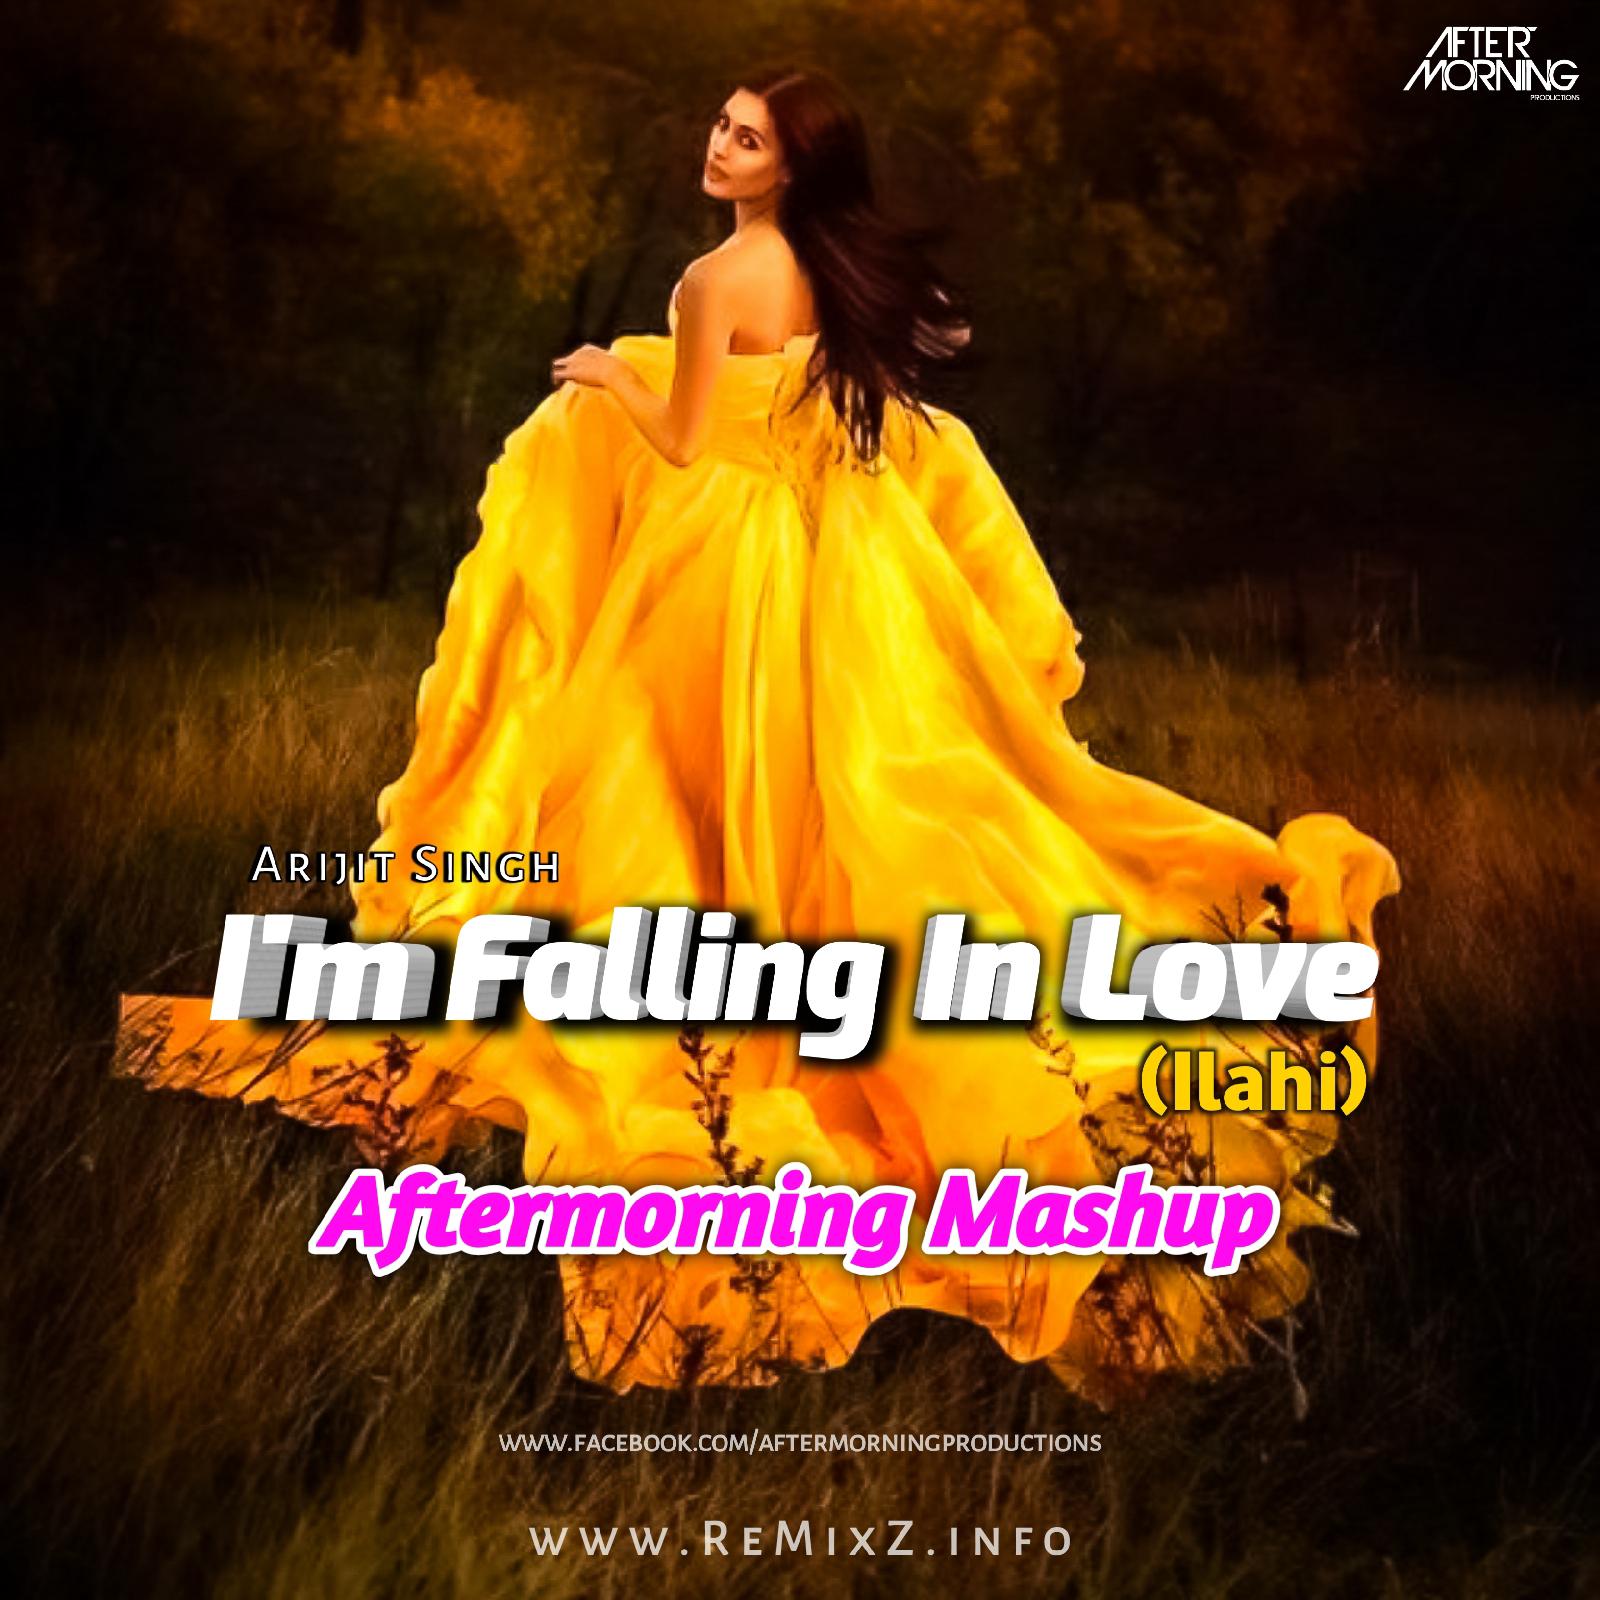 im-falling-in-love-ilahi-arijit-singh.jpg